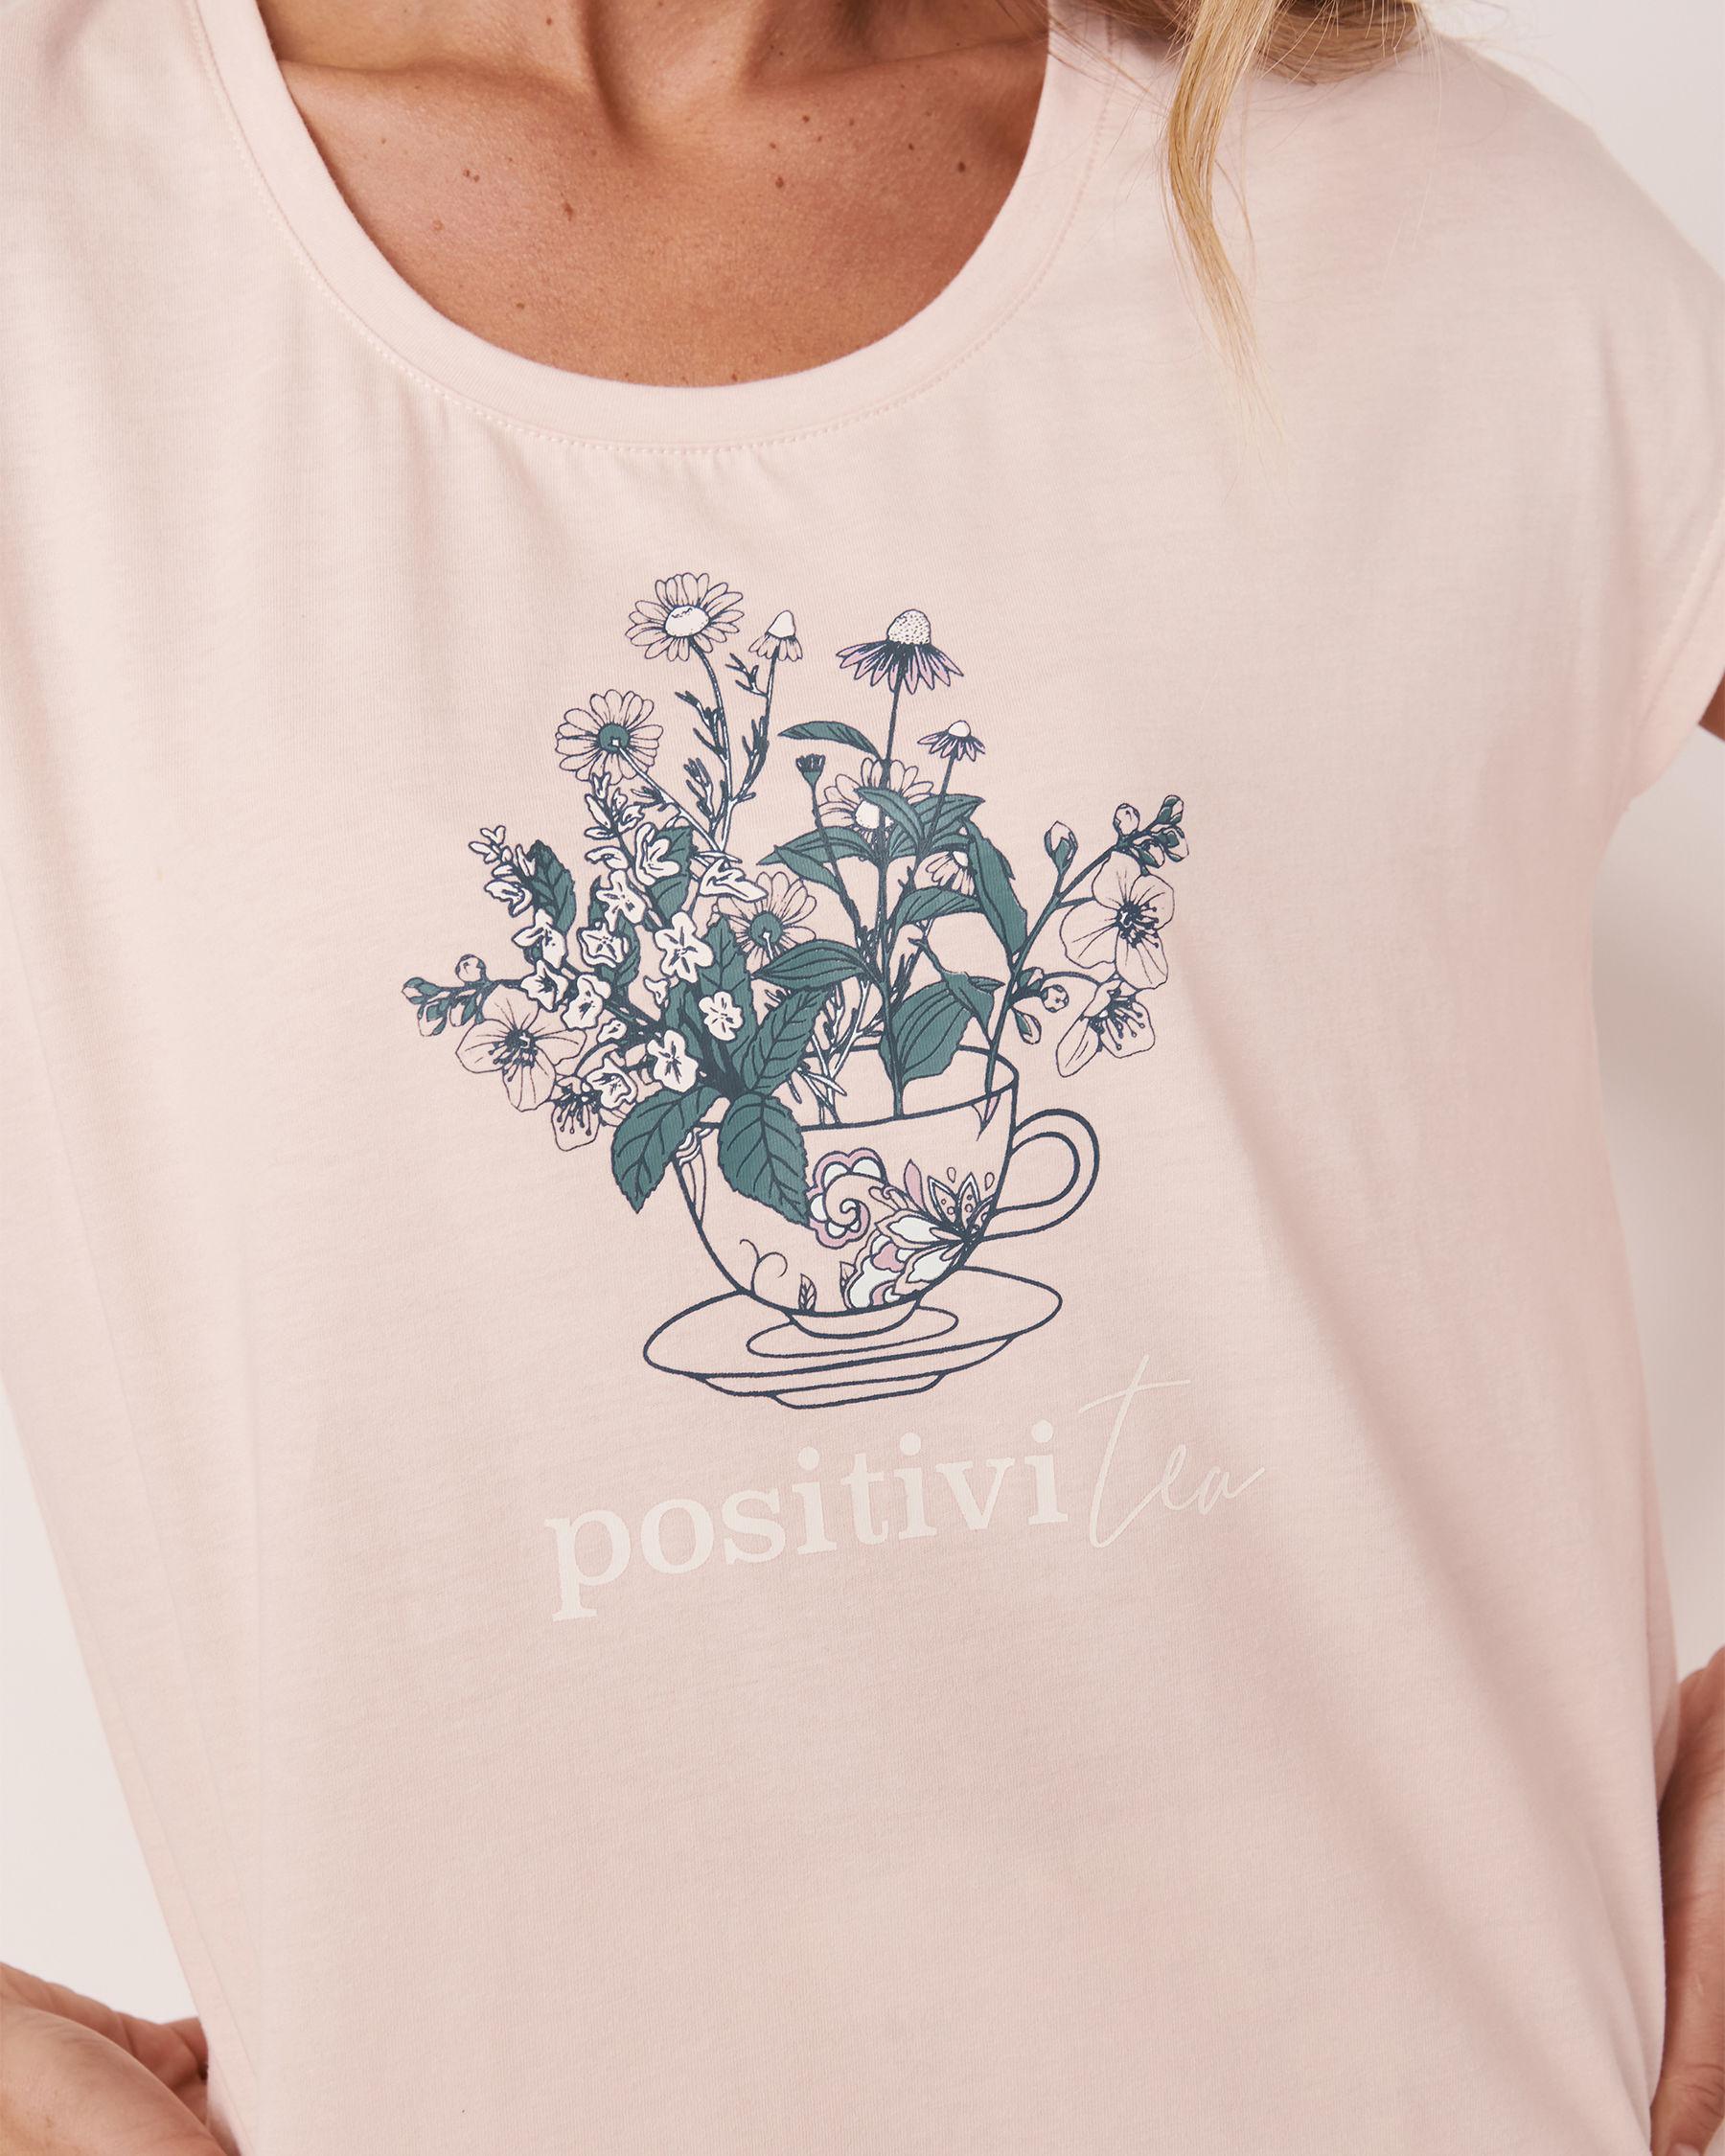 LA VIE EN ROSE Scoop Neck T-shirt Light pink 40100181 - View2